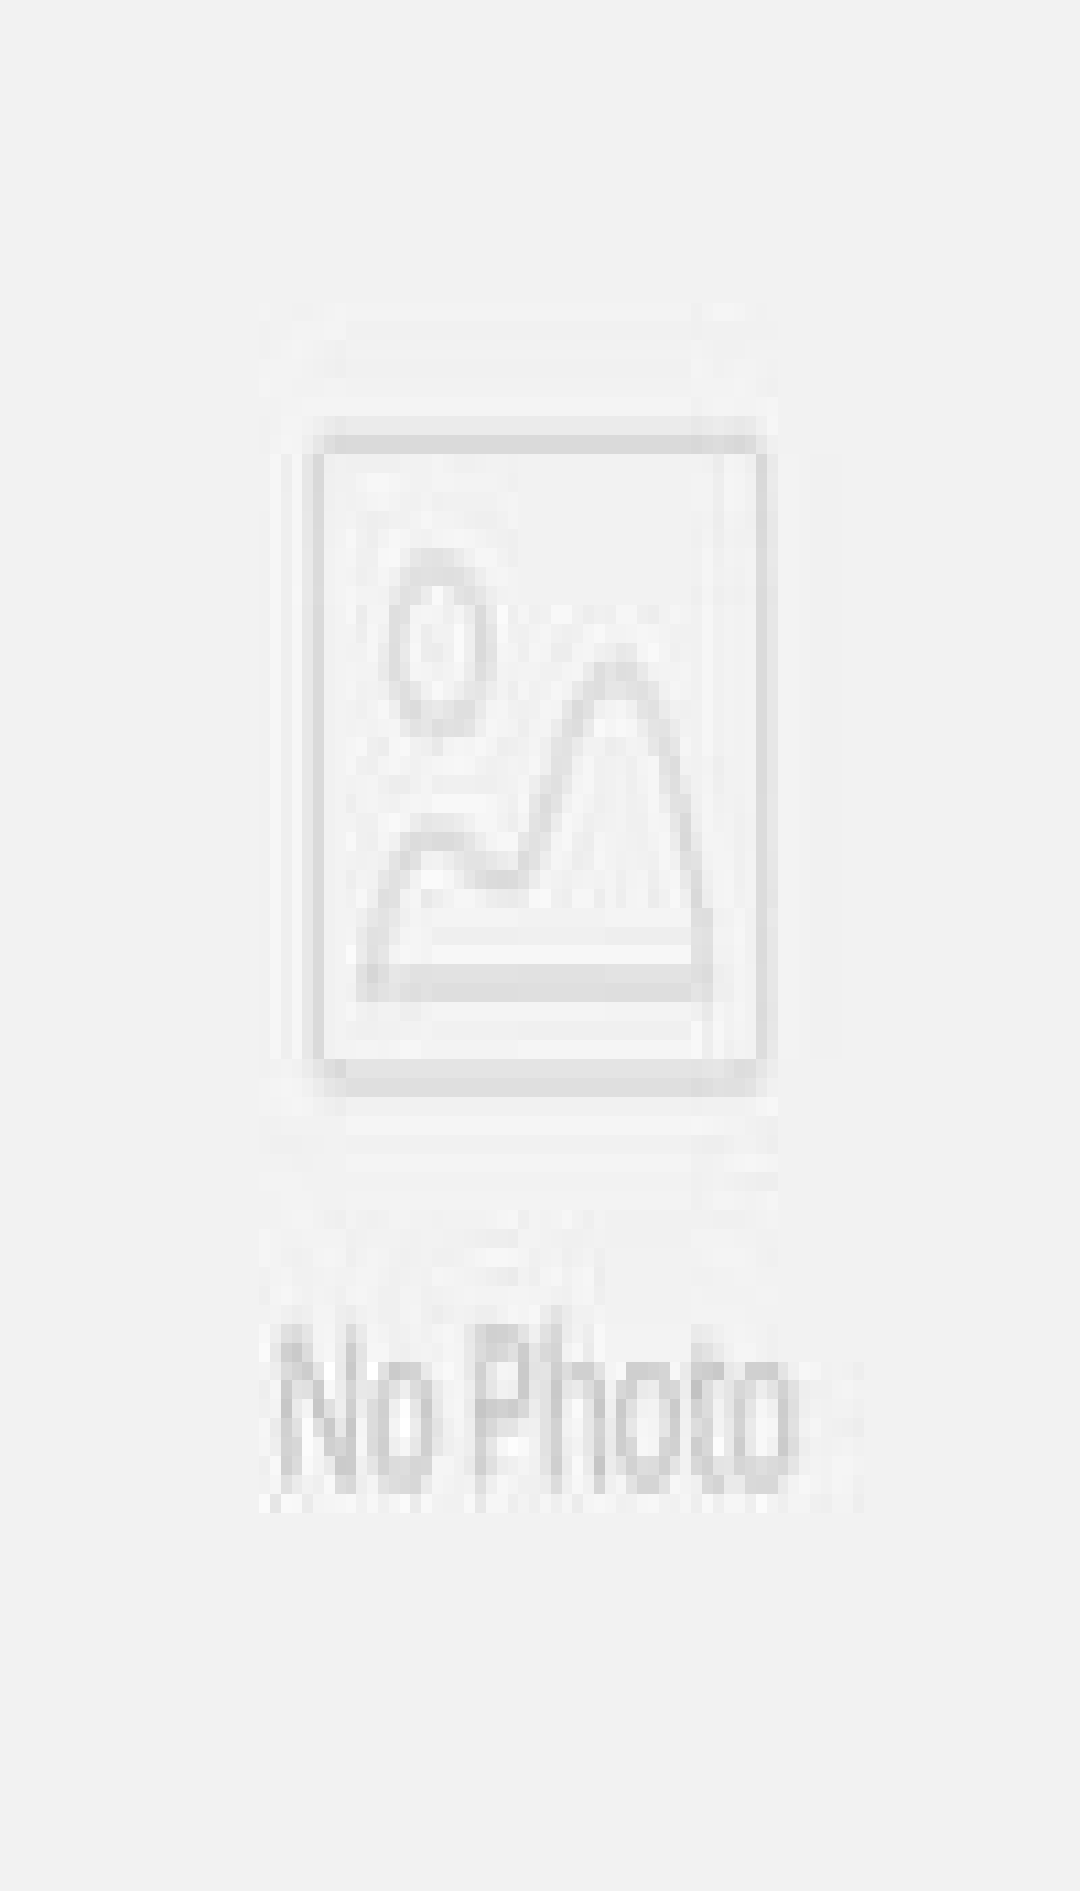 Original Xiaomi ZMI Aura QB822 Powerbank 20000 mAh Two Way Quick Charge 27W output Power Bank